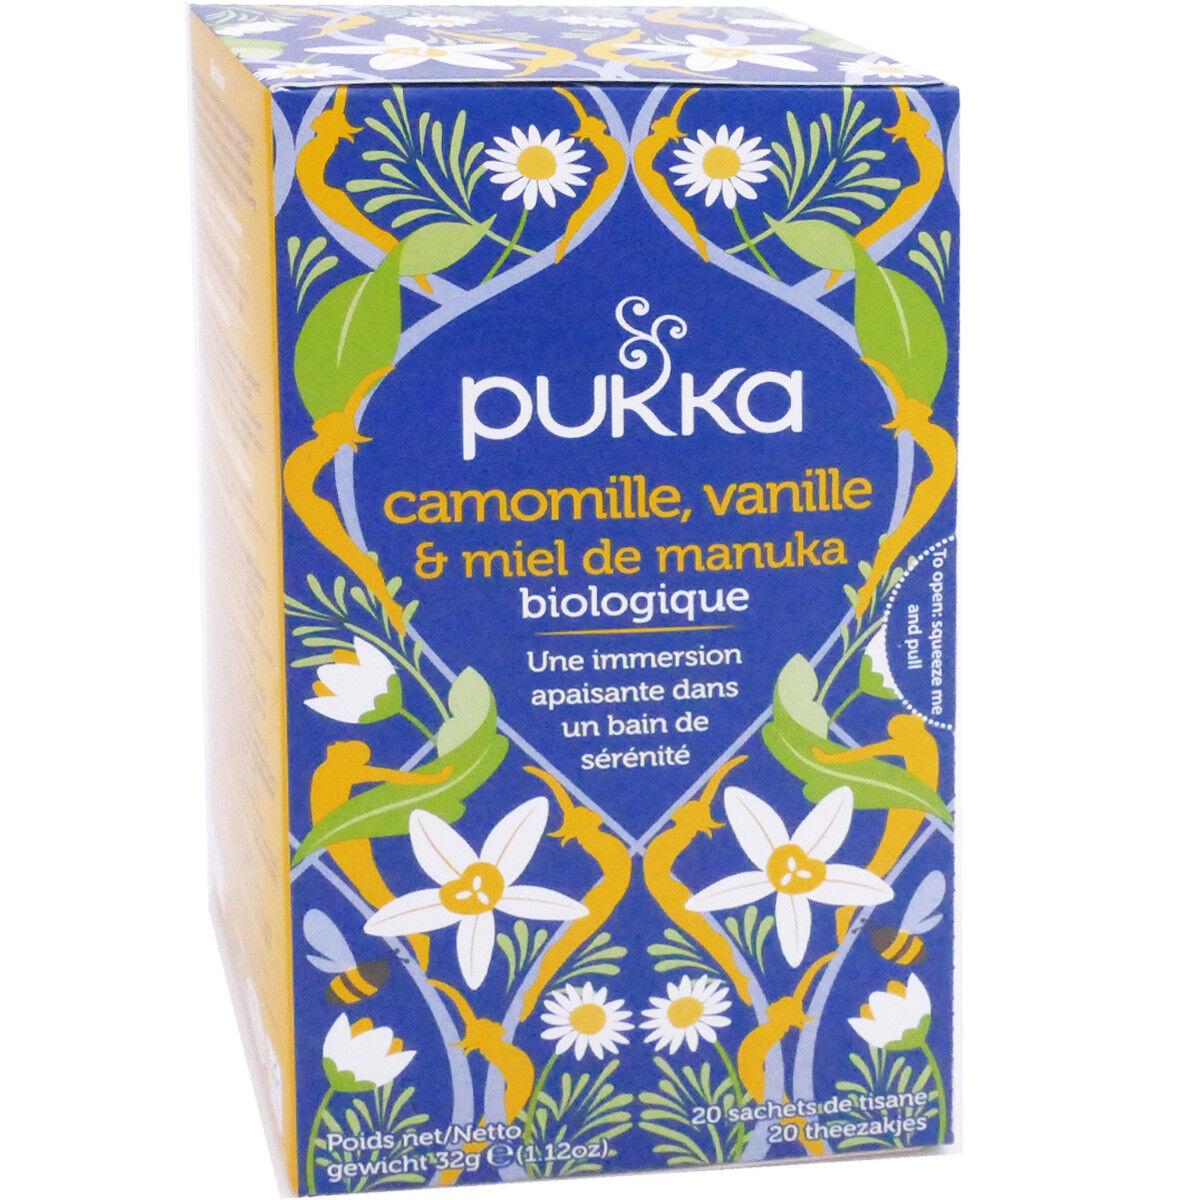 Pukka tisane 20 sachets camomille vanille miel de manuka